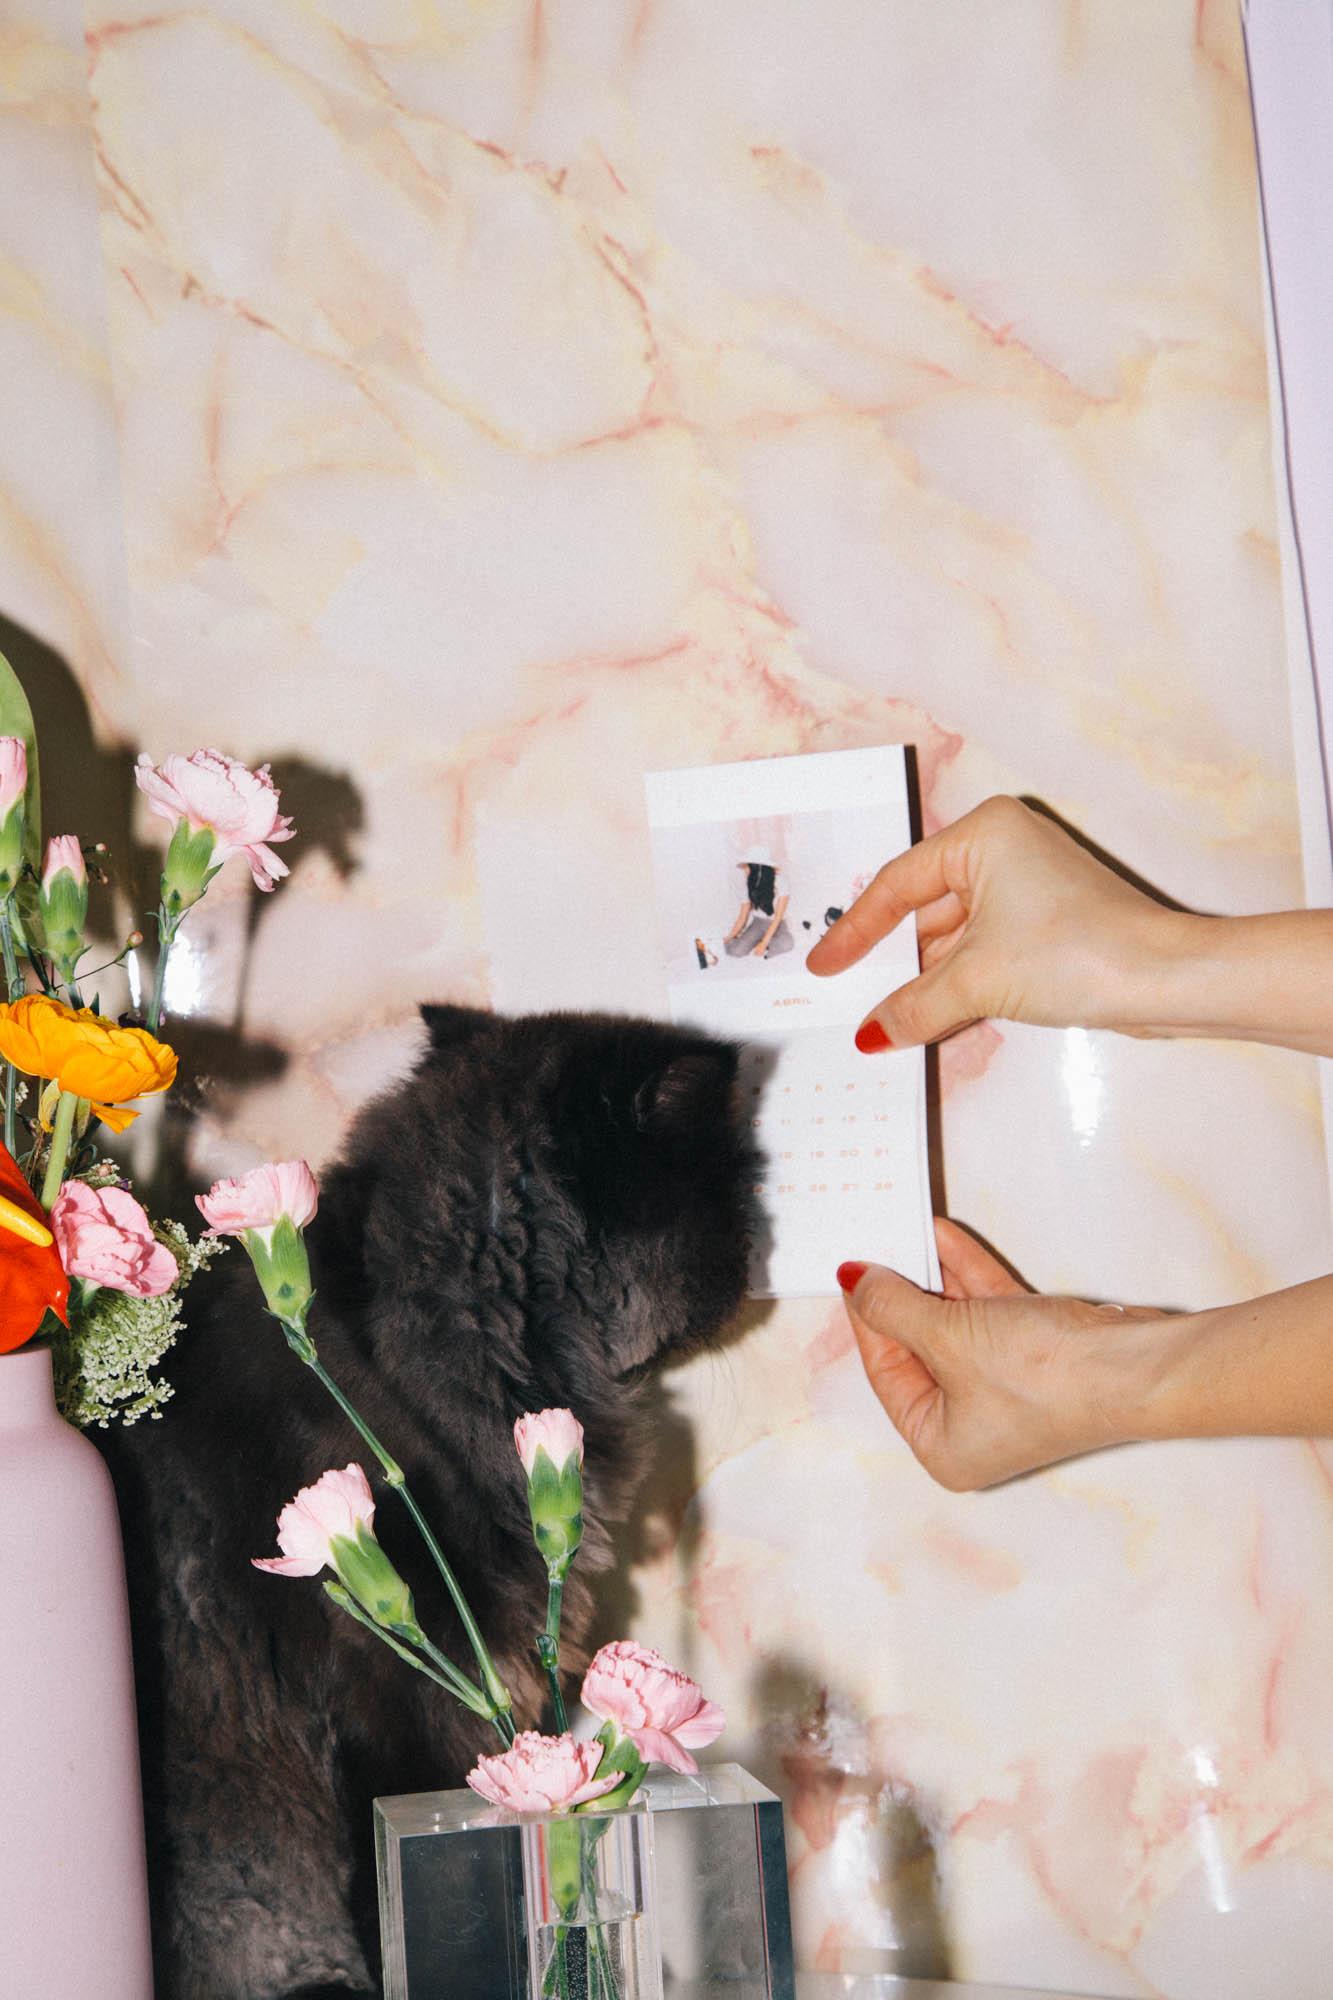 IMG_6840-cat-calendar-puno-goodsgang-krizia-2018-3.jpg